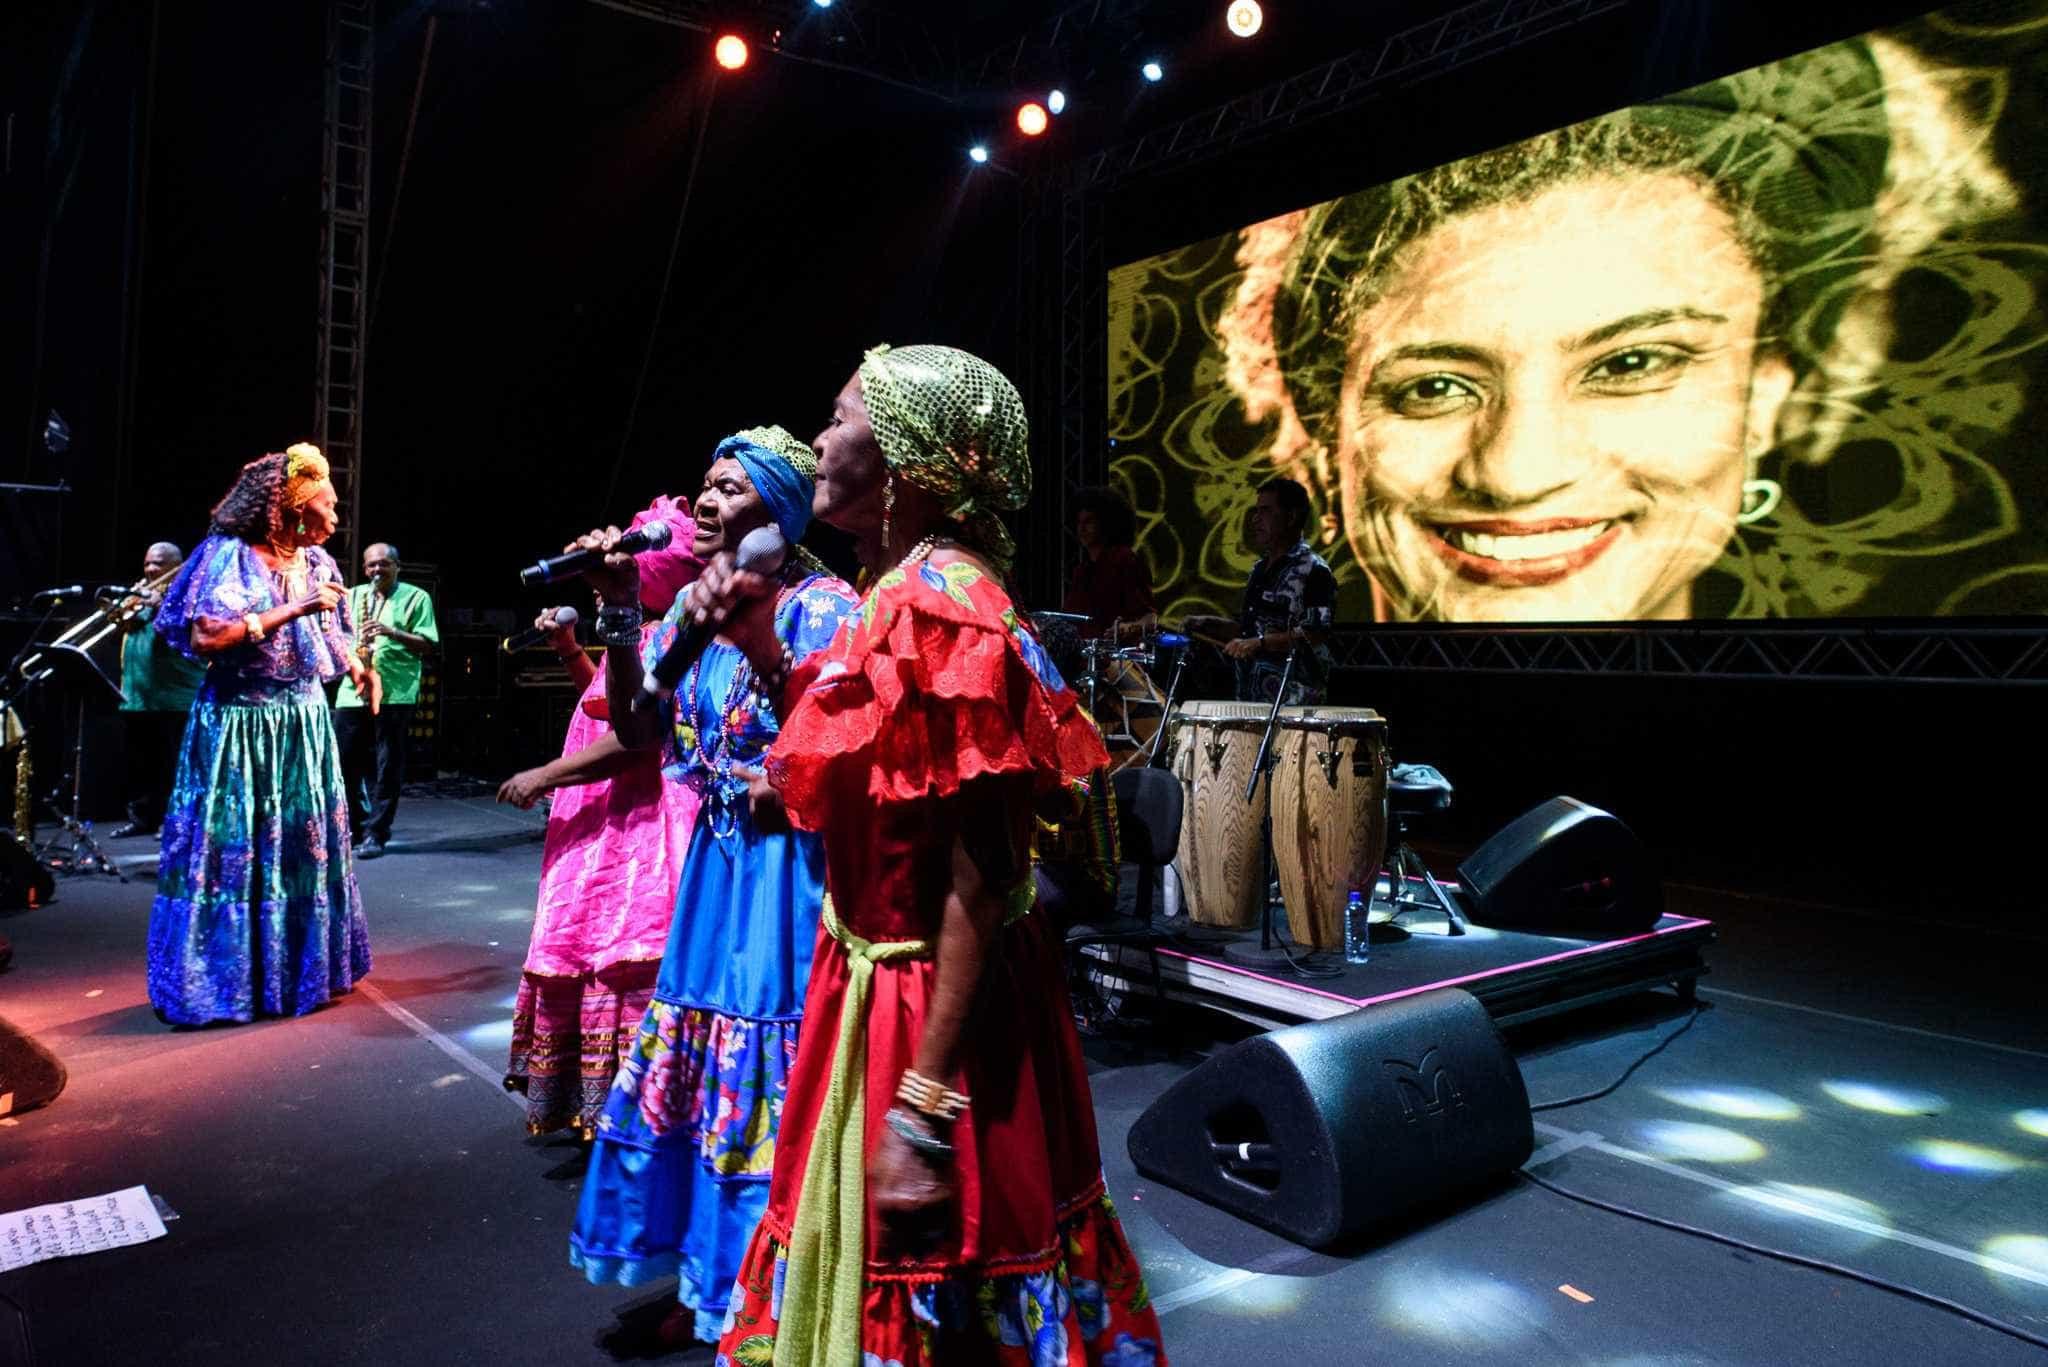 Mimo enfrenta crise, mas leva público numeroso a ruas de Olinda